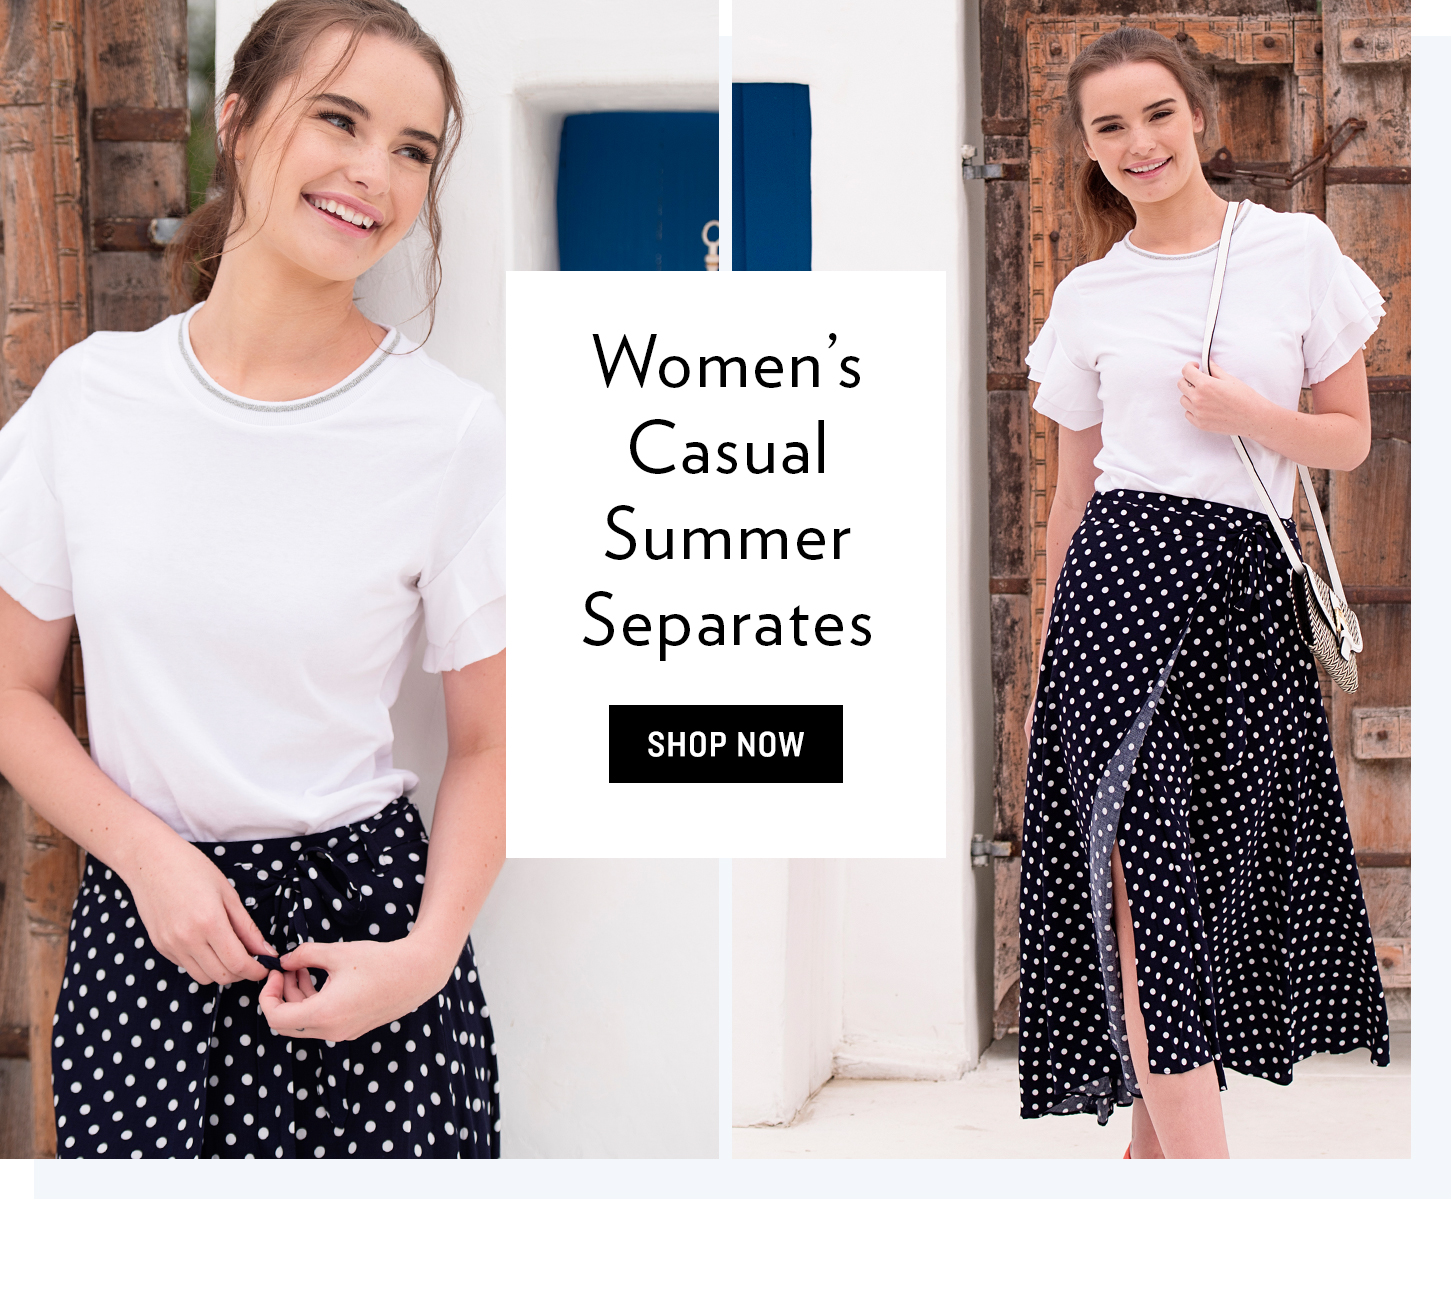 Shop Women's Casual Separates